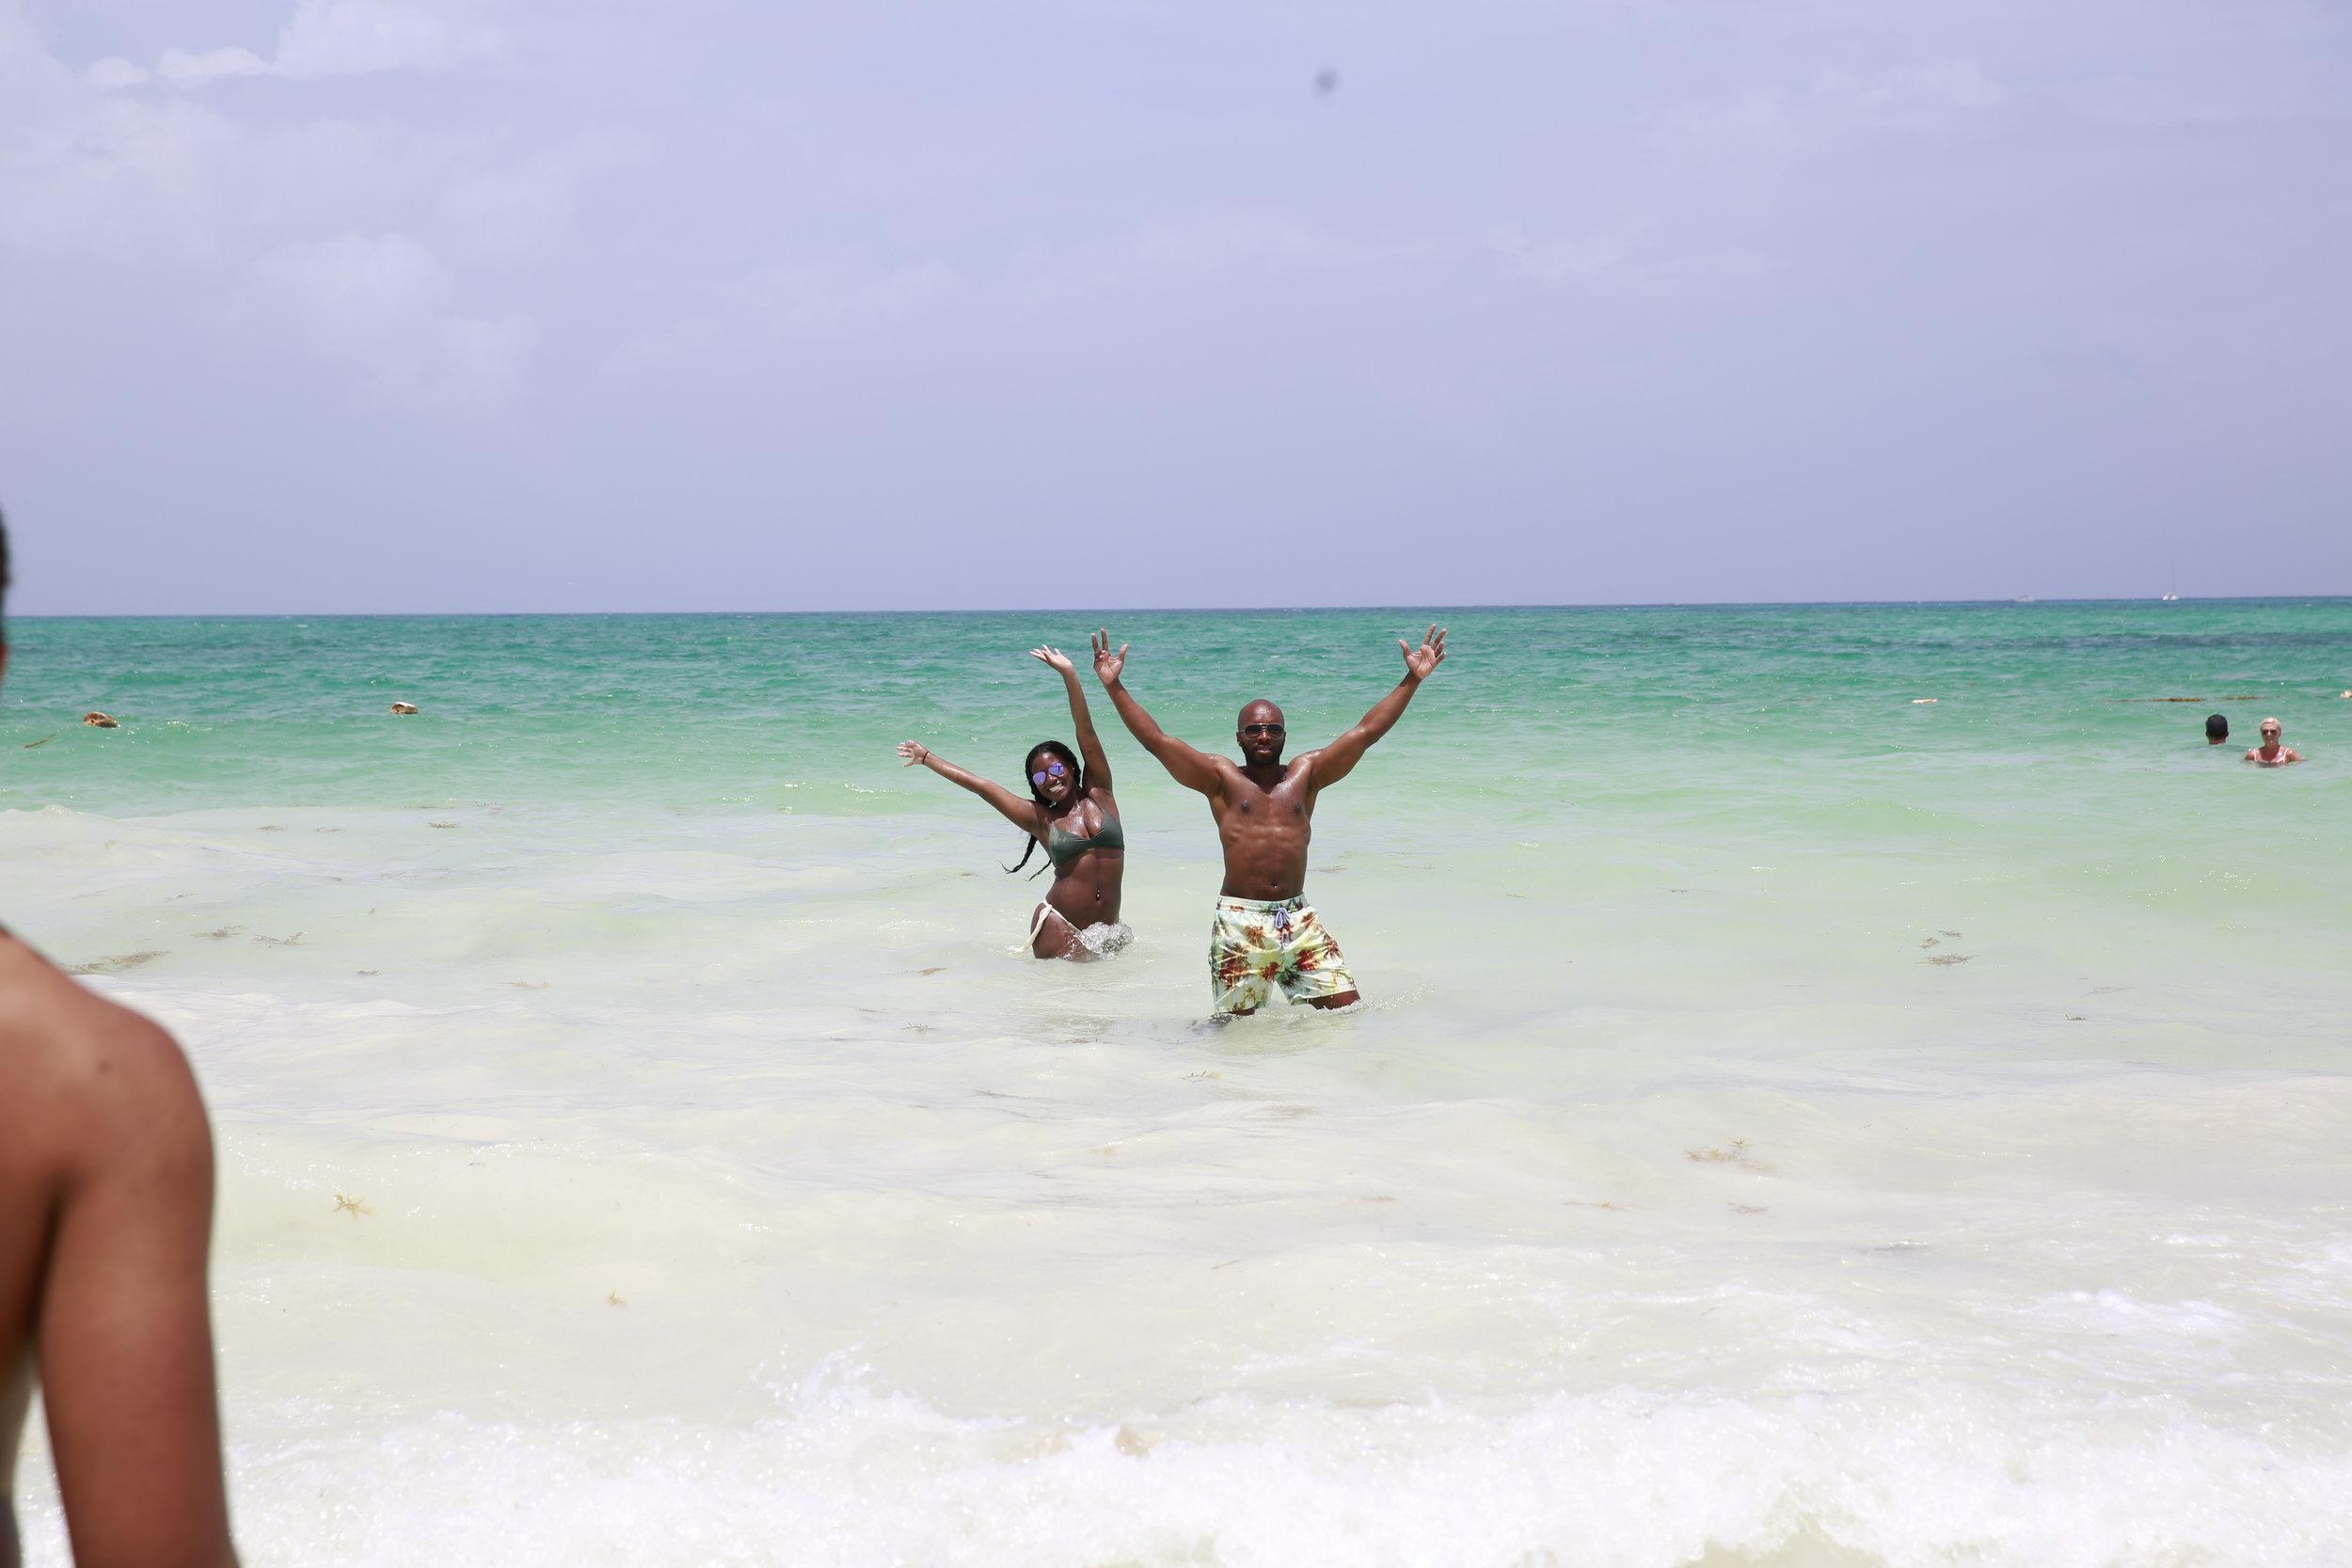 Black Destination Bride - BlackDesti Wedding Countdown Journal - Bridefriends Podcast - 1 Playa del Carmen Mexico - Secrets Maroma beach3.JPG